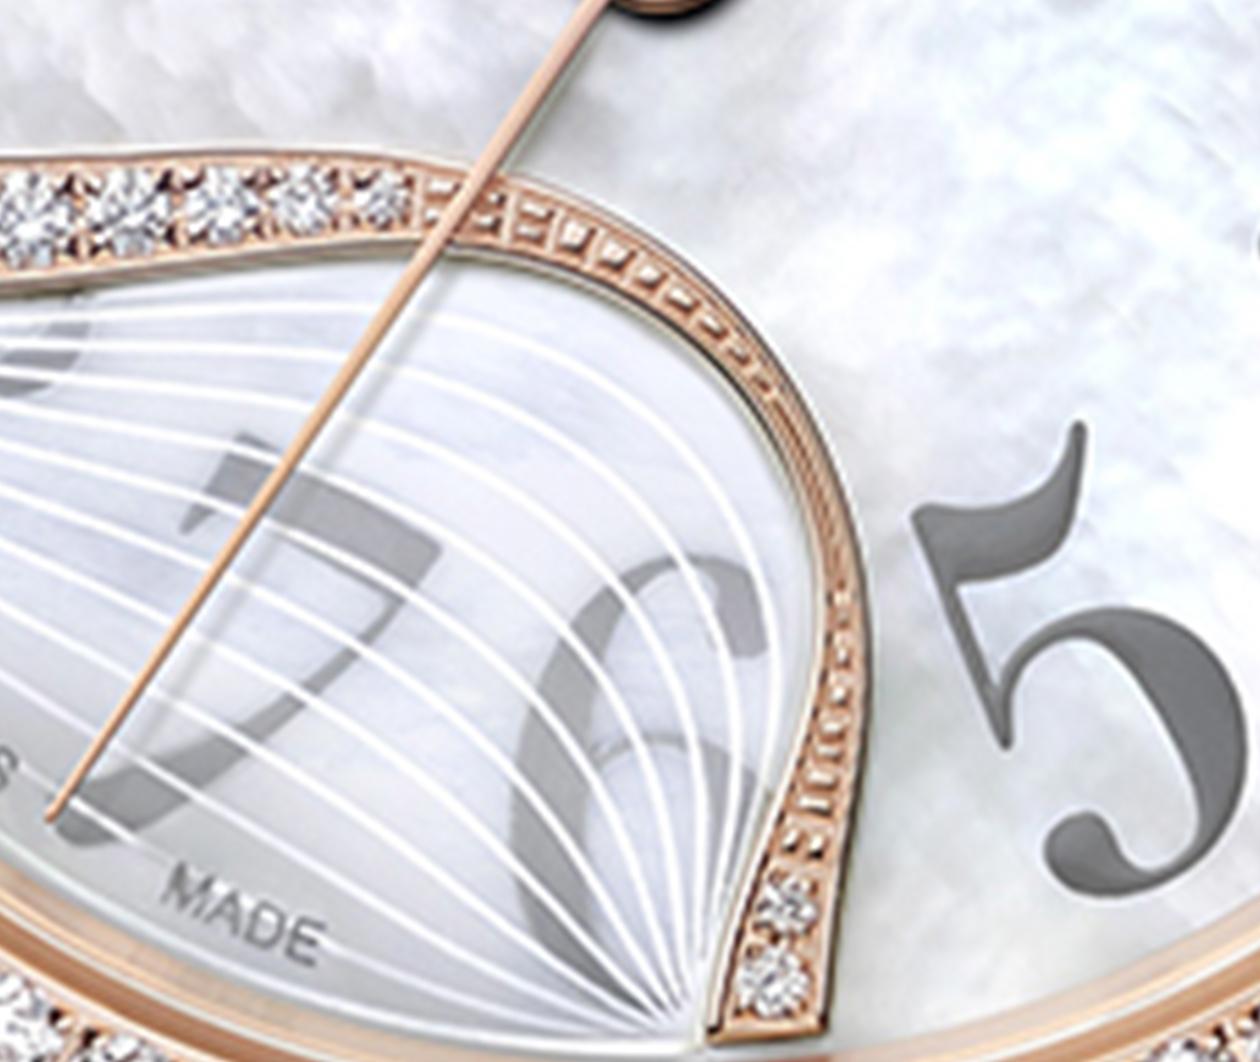 UlysseNardin Classico Jade 8152230B6001 Carousel 3 FINAL